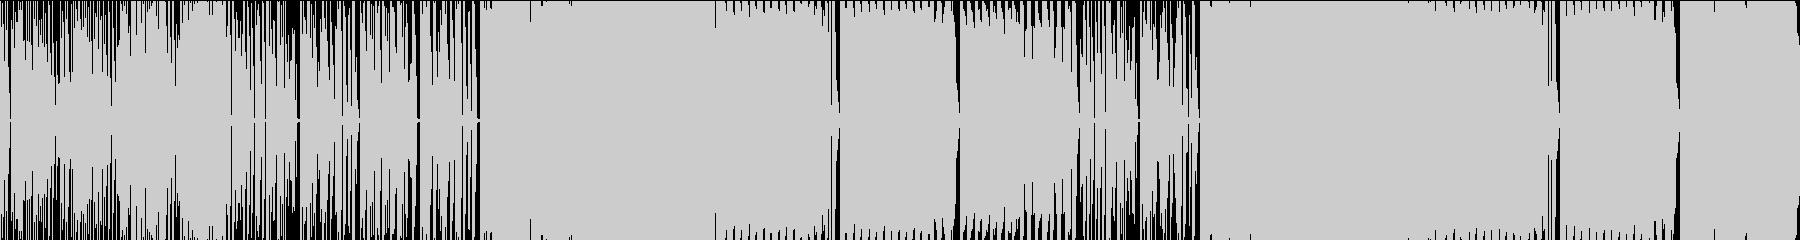 JPOPっぽい構成の8bitの曲の未再生の波形